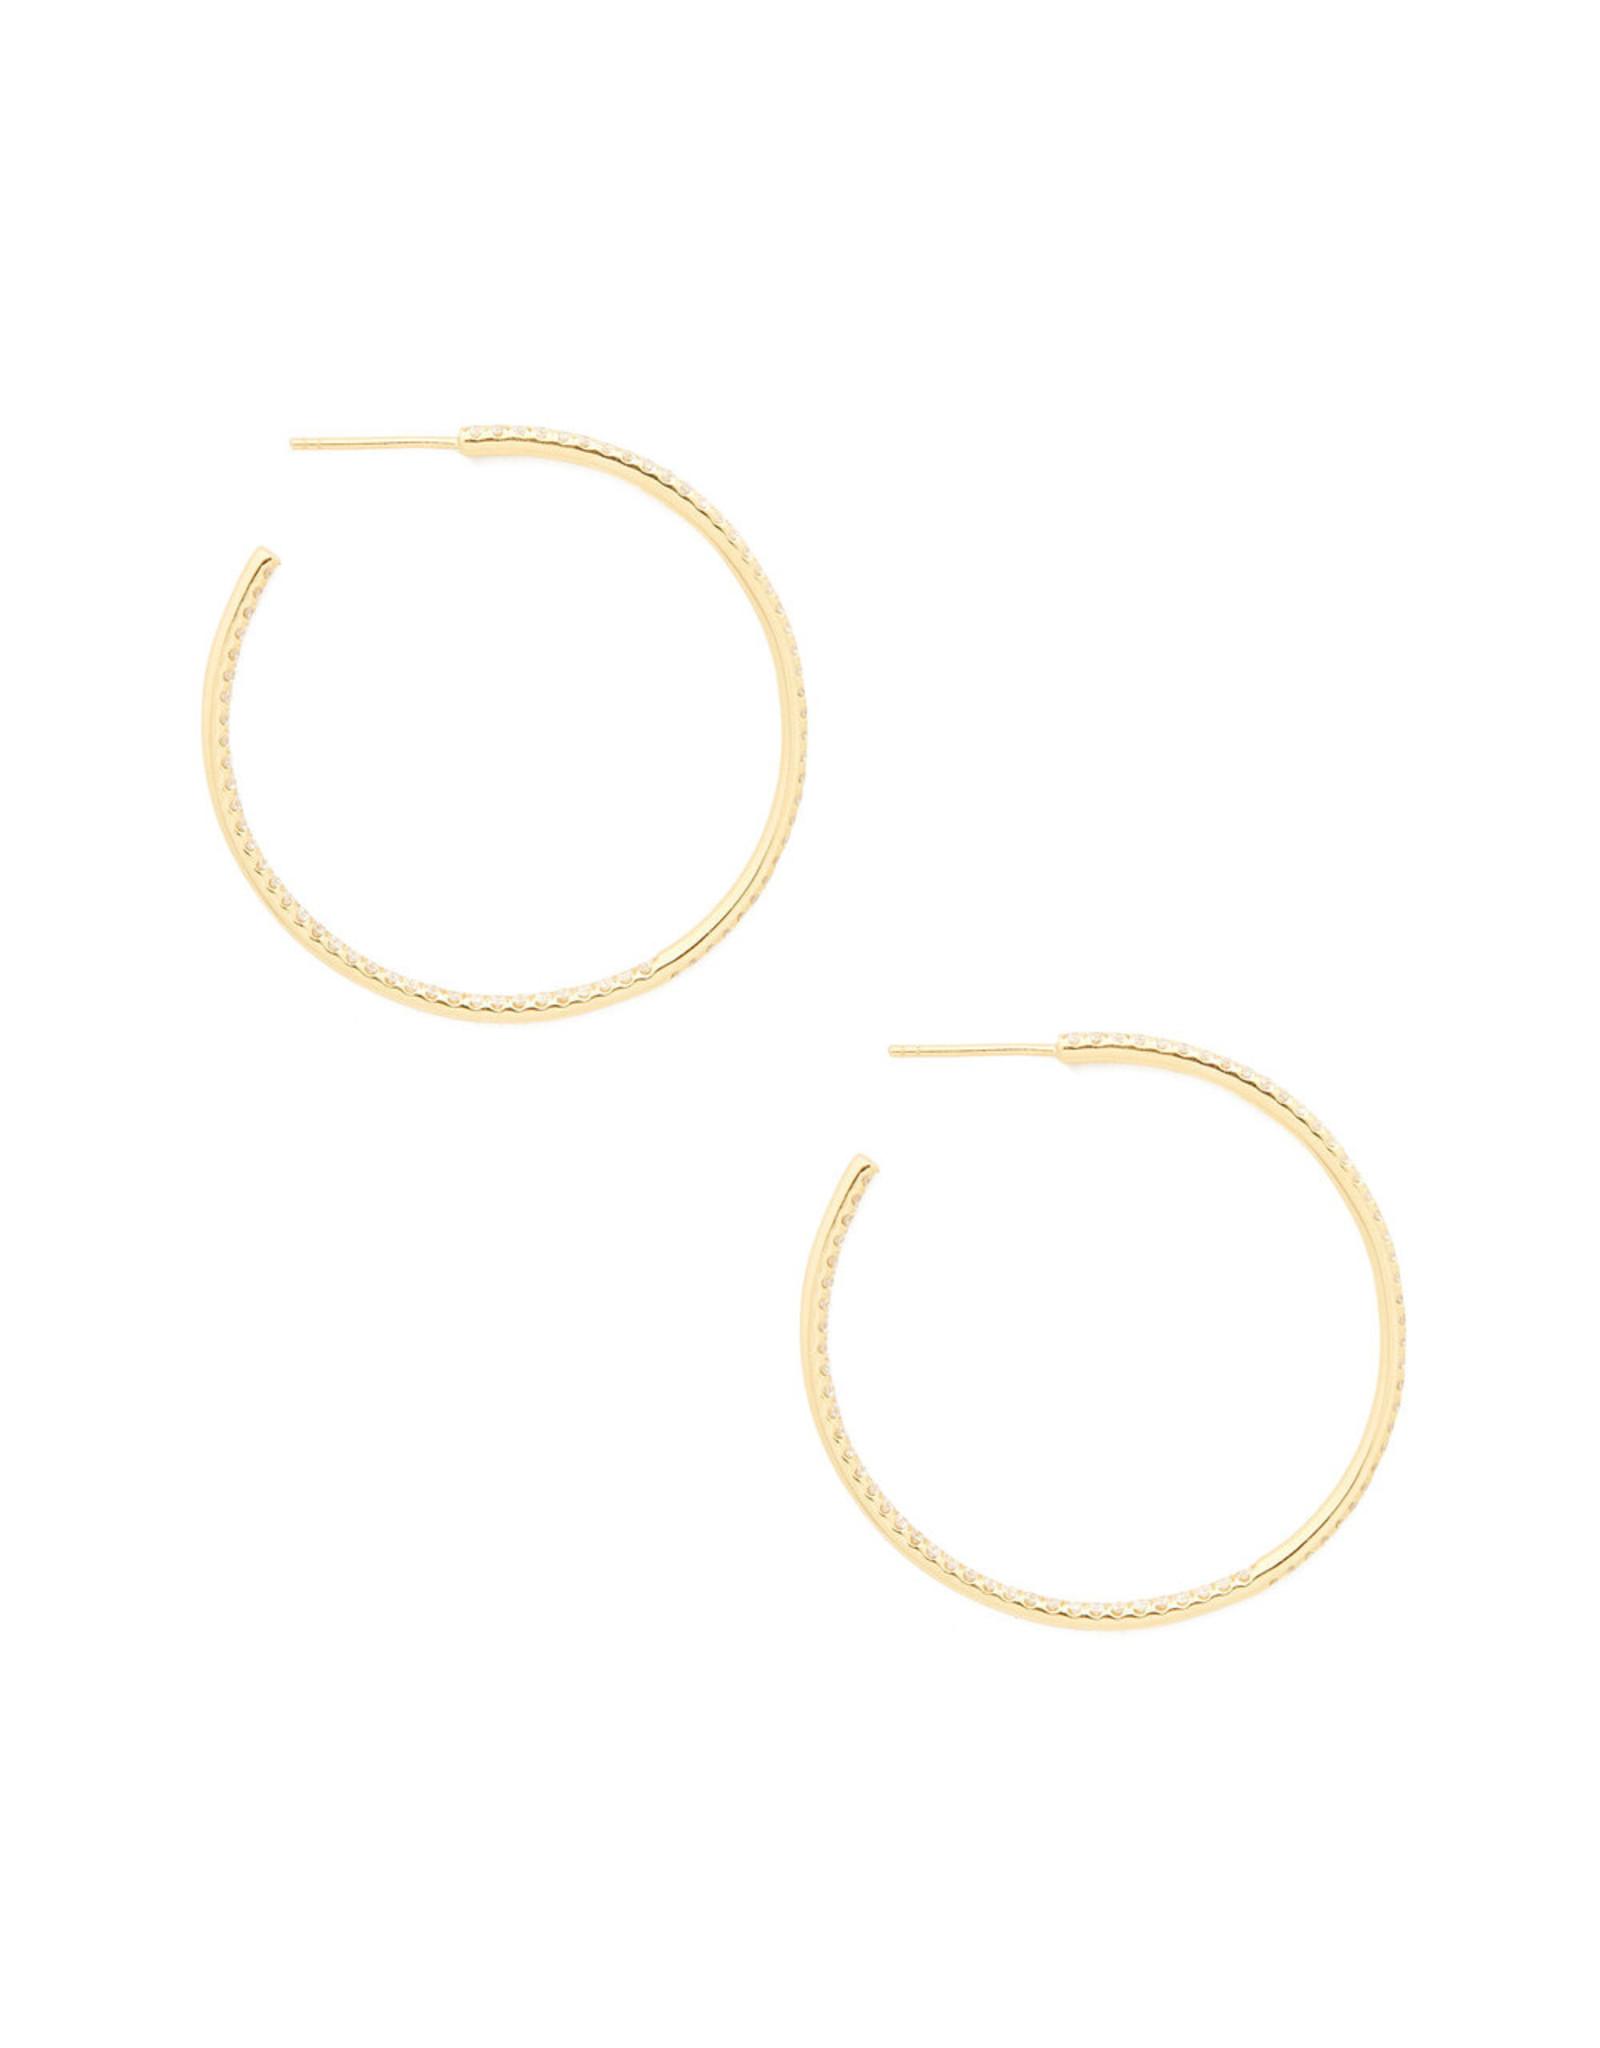 Sara Weinstock Sara Weinstock Veena Pavé Hoop Earrings (Color: Yellow Gold)